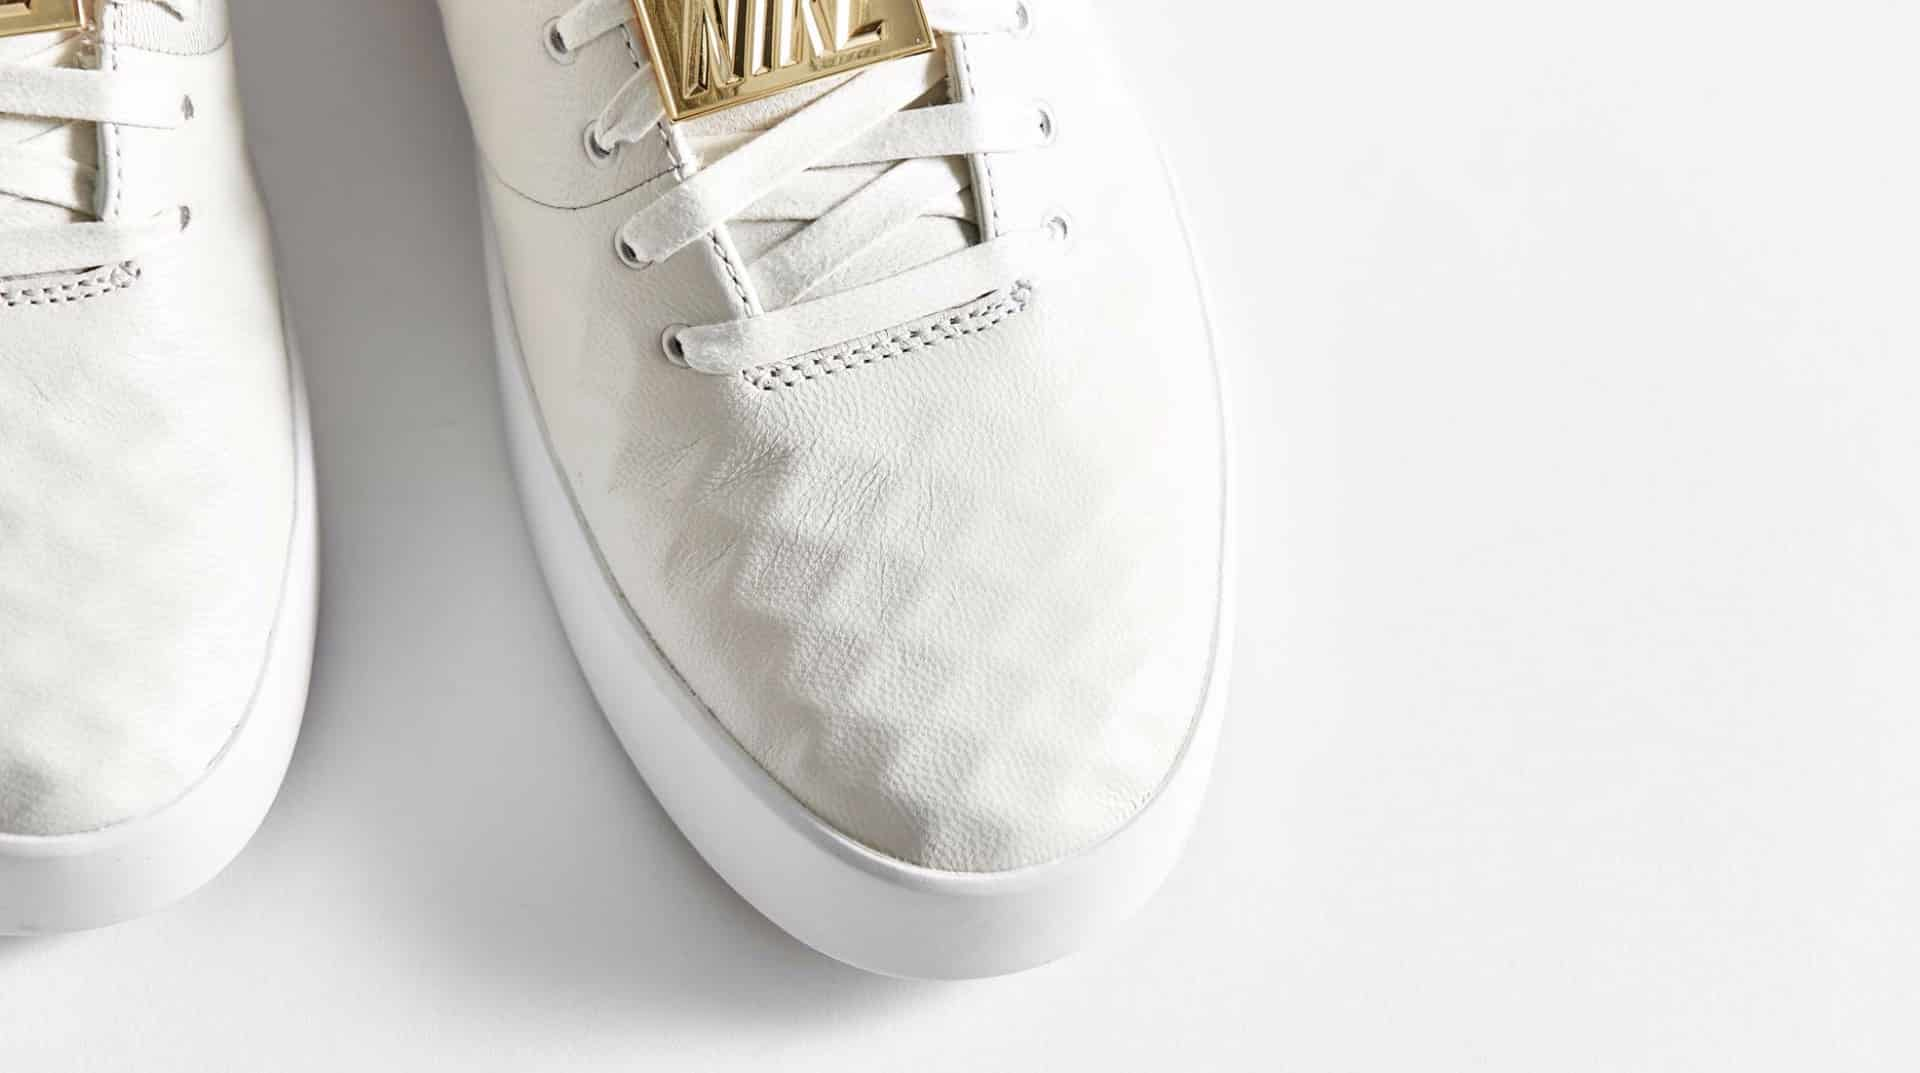 sneakers-nike-tiempo-vetta-17-ivory-img2